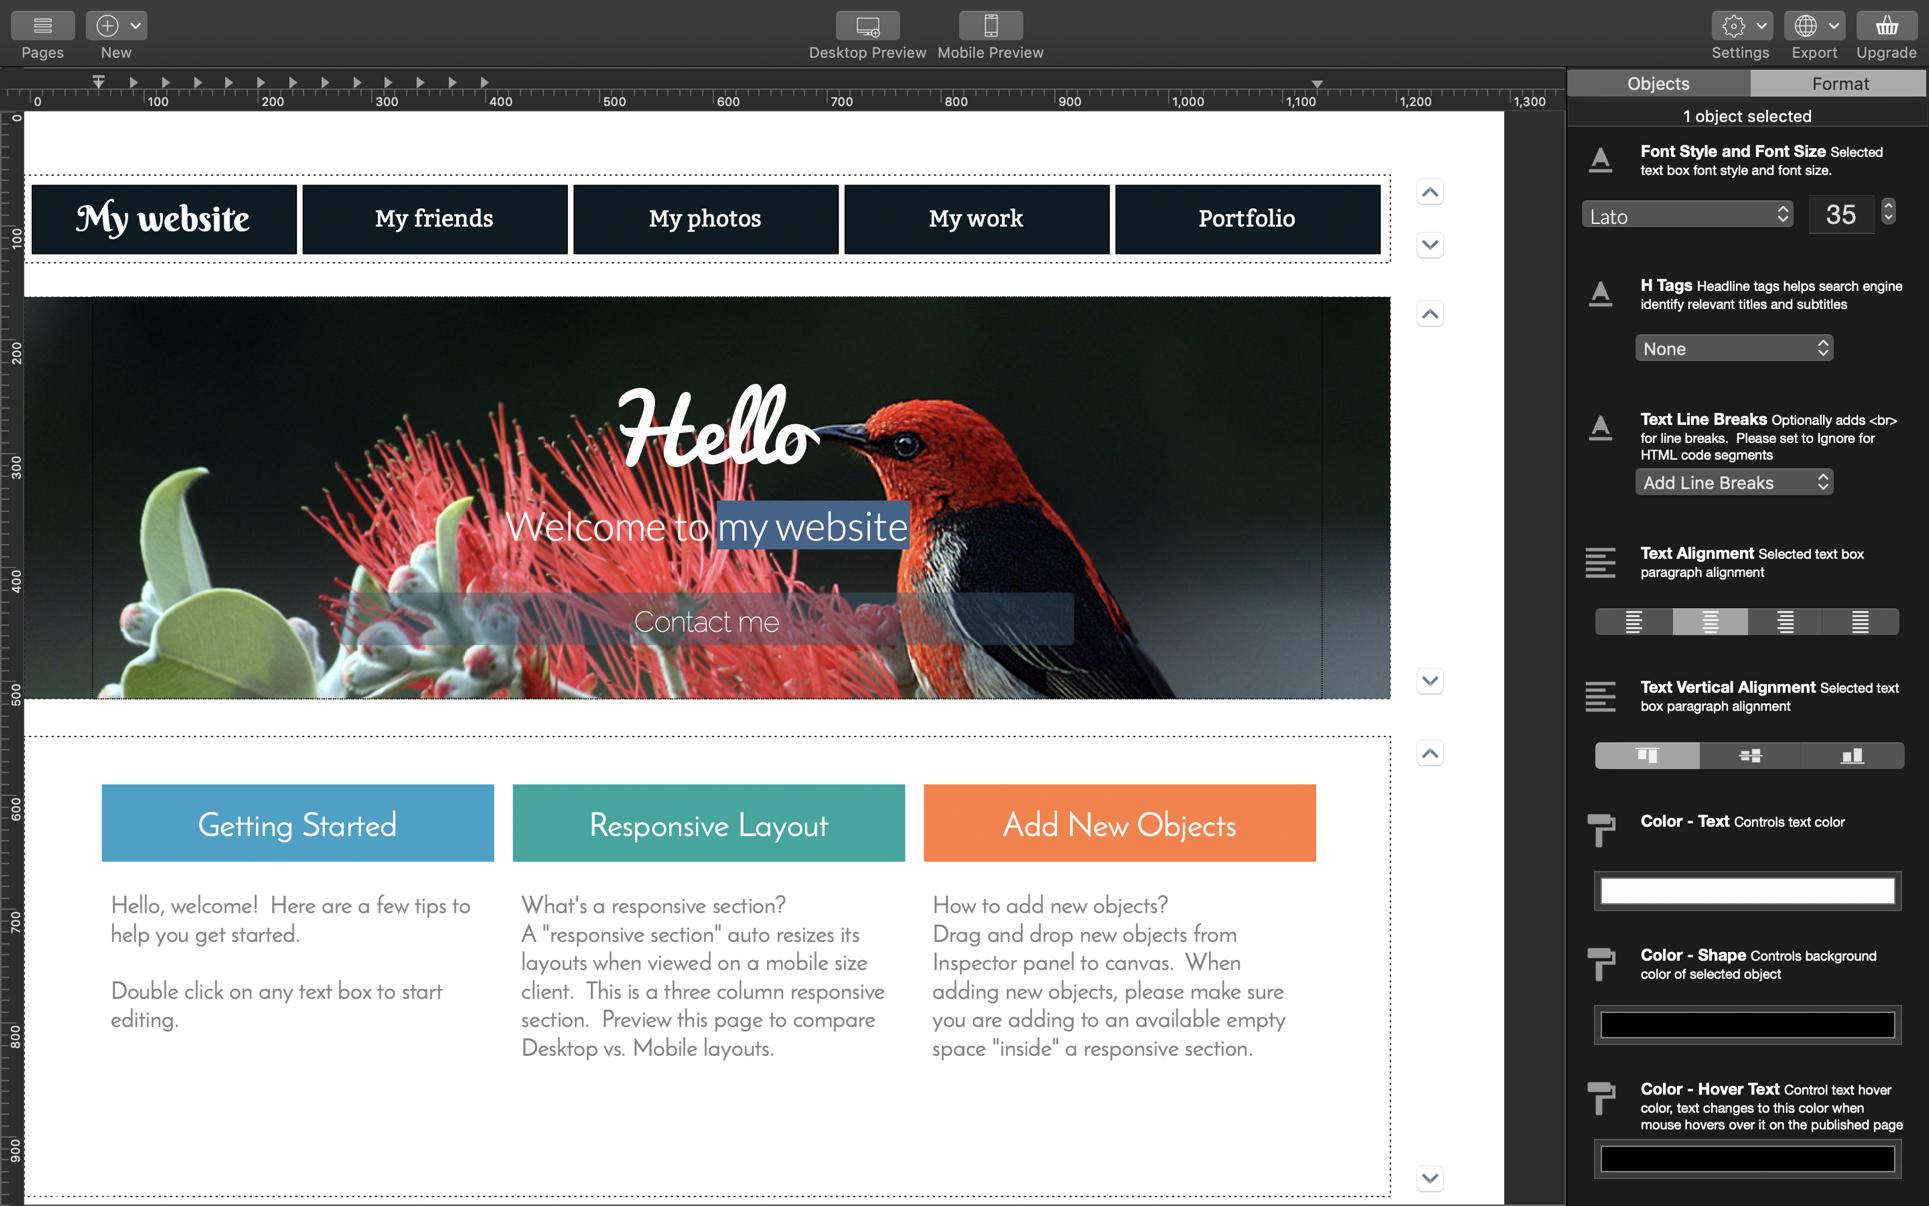 Wolf 2 Responsive Designer 3.03 Mac 破解版 网站设计软件